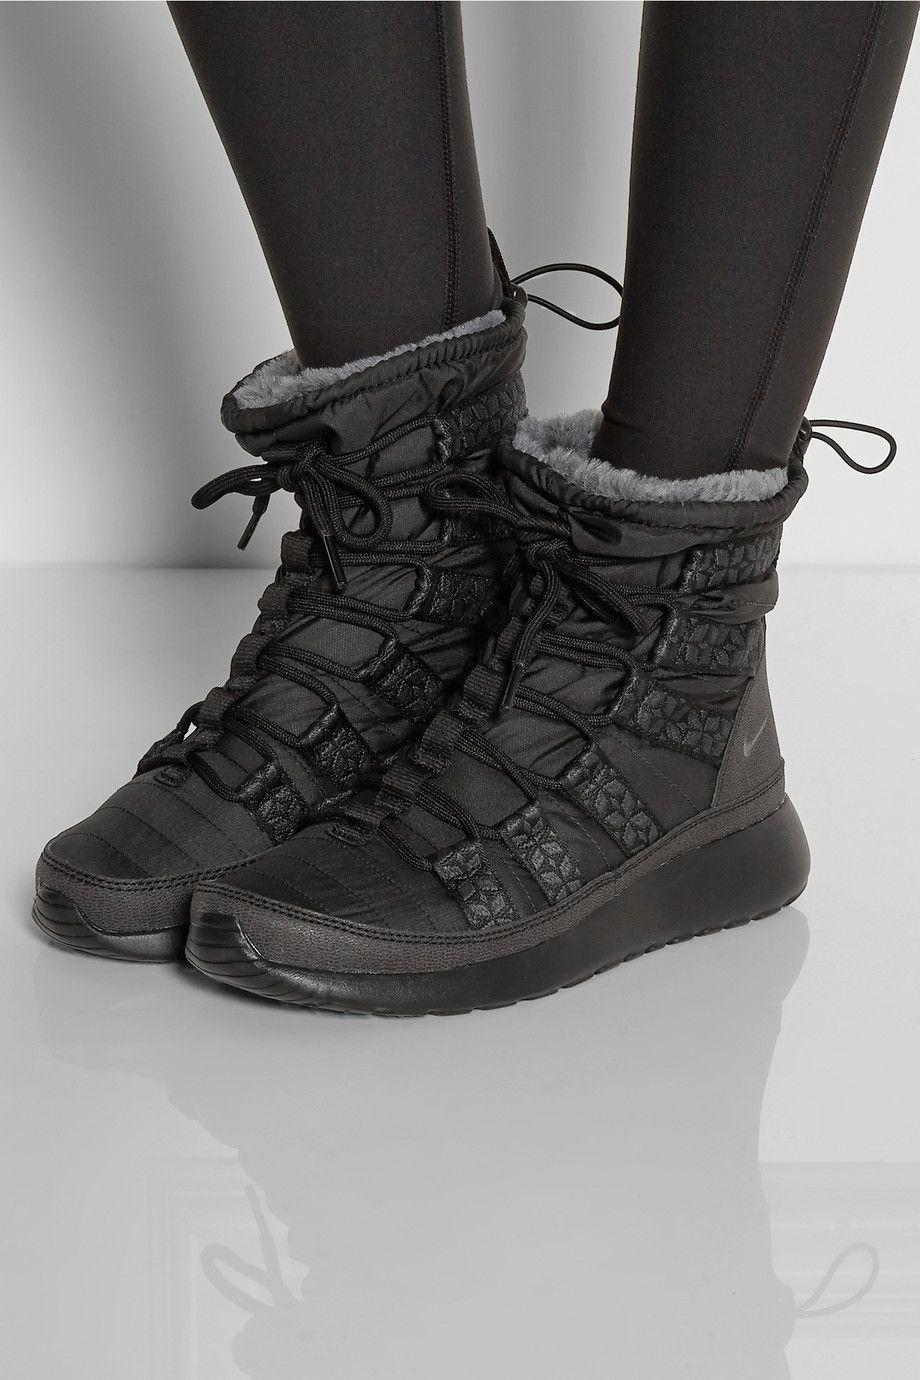 the best attitude d66a8 8a84c ... Nike   Roshe Run Hi shell sneaker-style boots   NET-A-PORTER ...